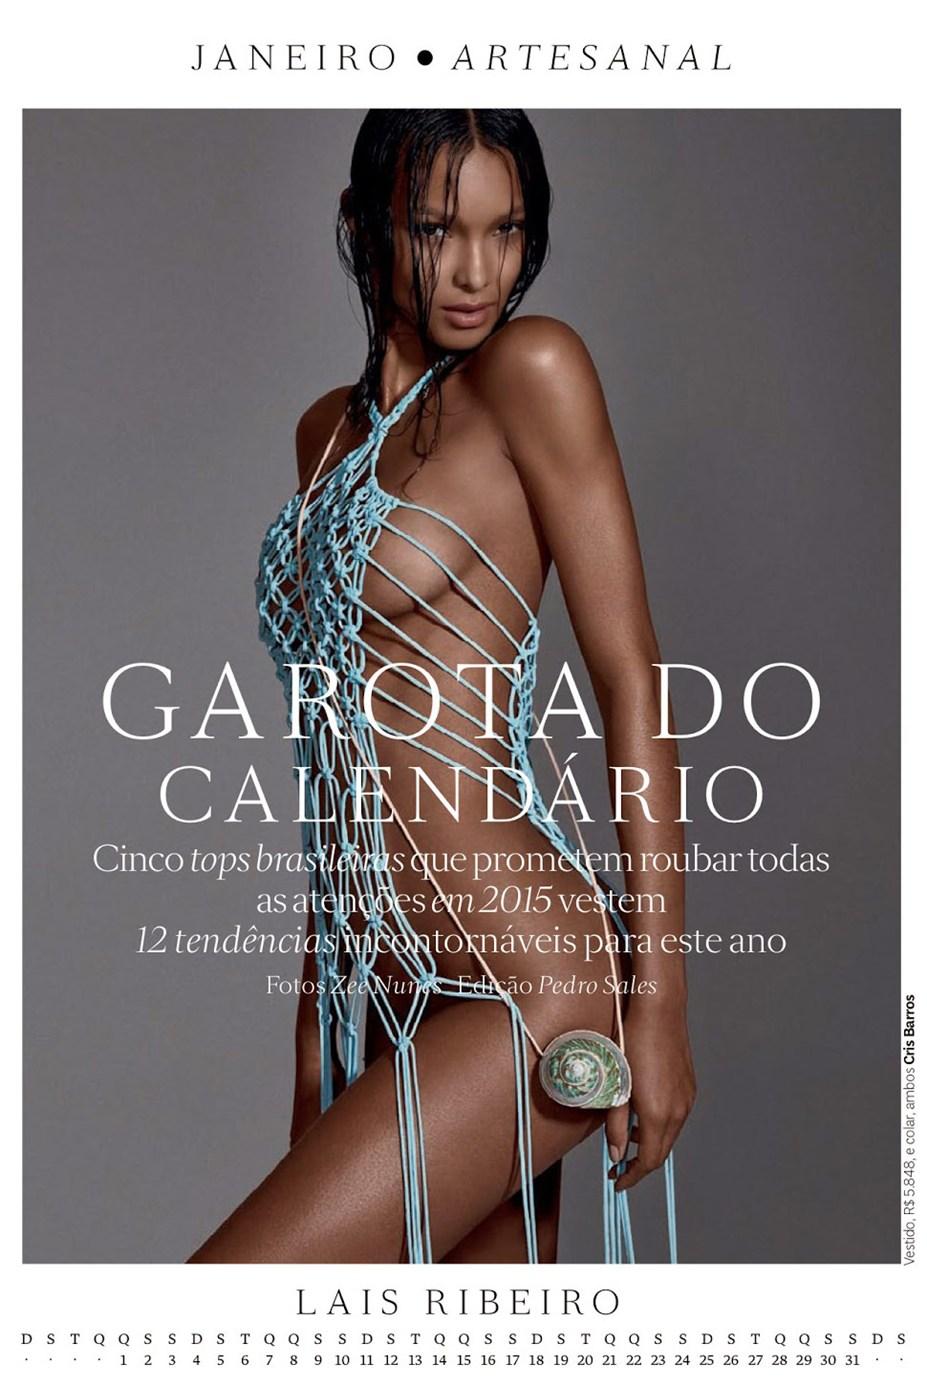 Календарь журнала Vogue Brazil 2015 / Calendar Girl by Zee Nunes - Lais Ribeiro / Лаис Рибейро